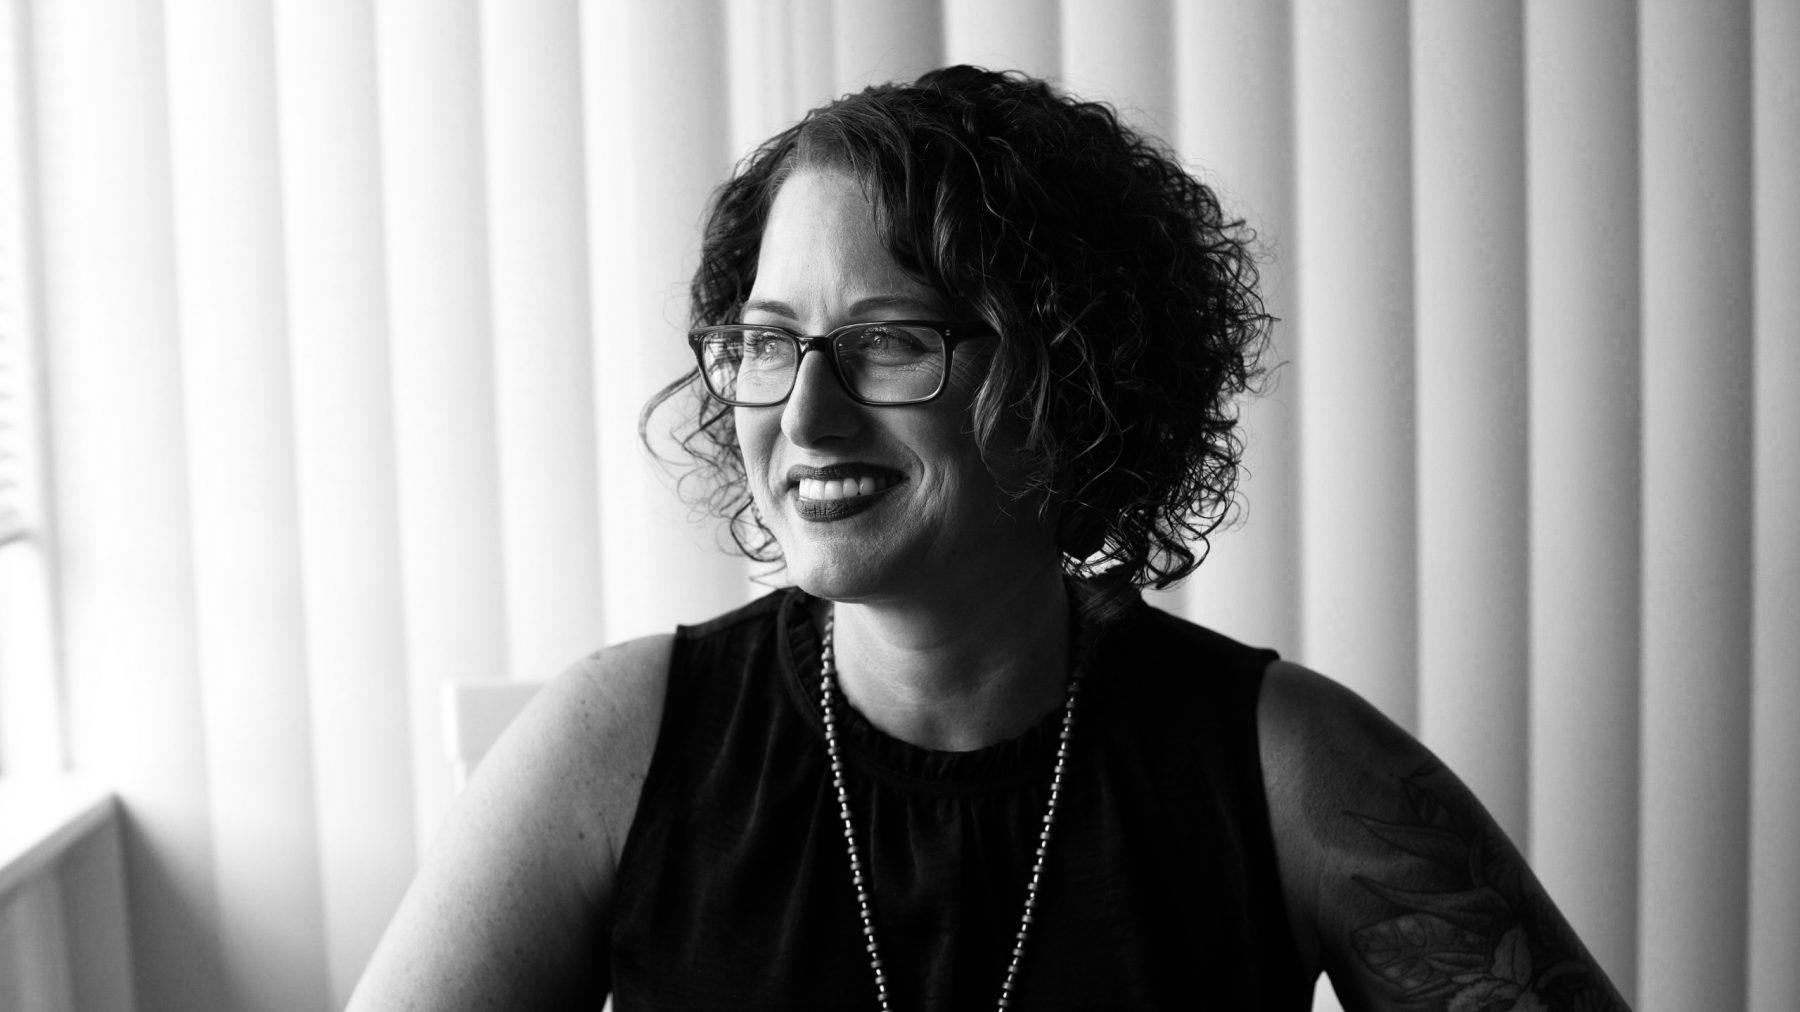 Episode 017 – Melanie Rushforth of Northwest Spay and Neuter Center